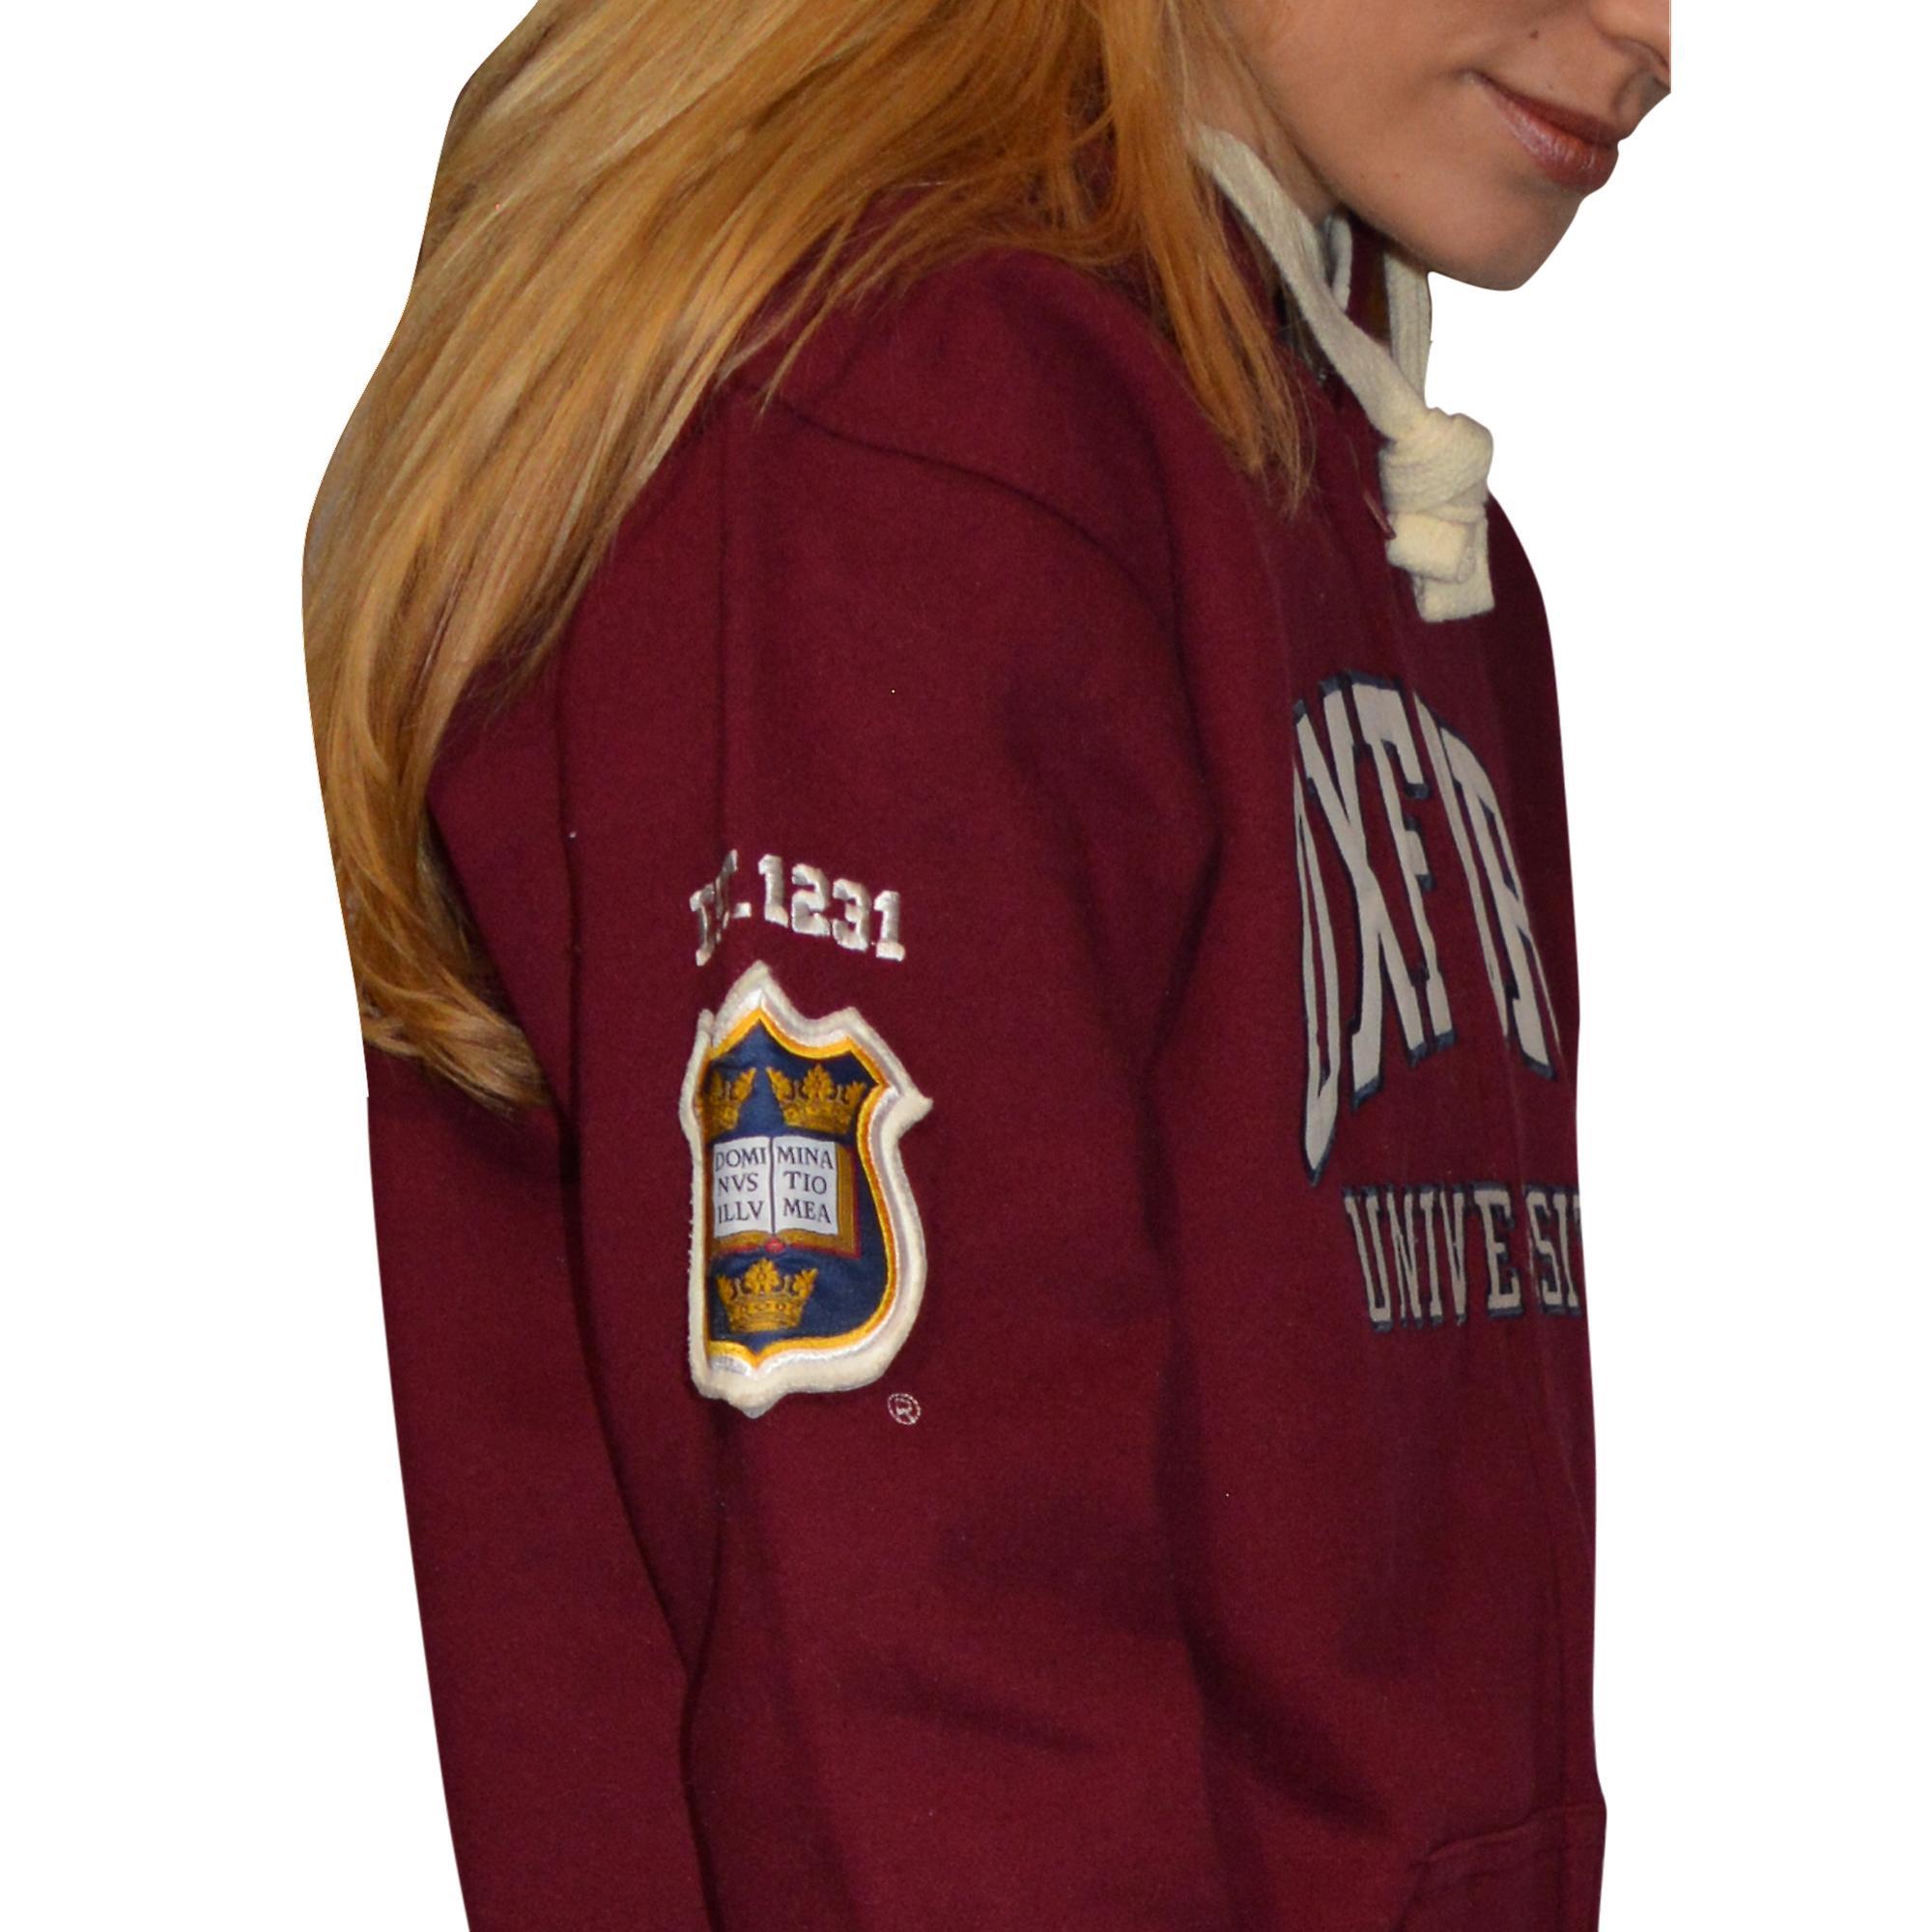 Ou129 licensed zipped unisex oxford university™ hooded sweatshirt maroon